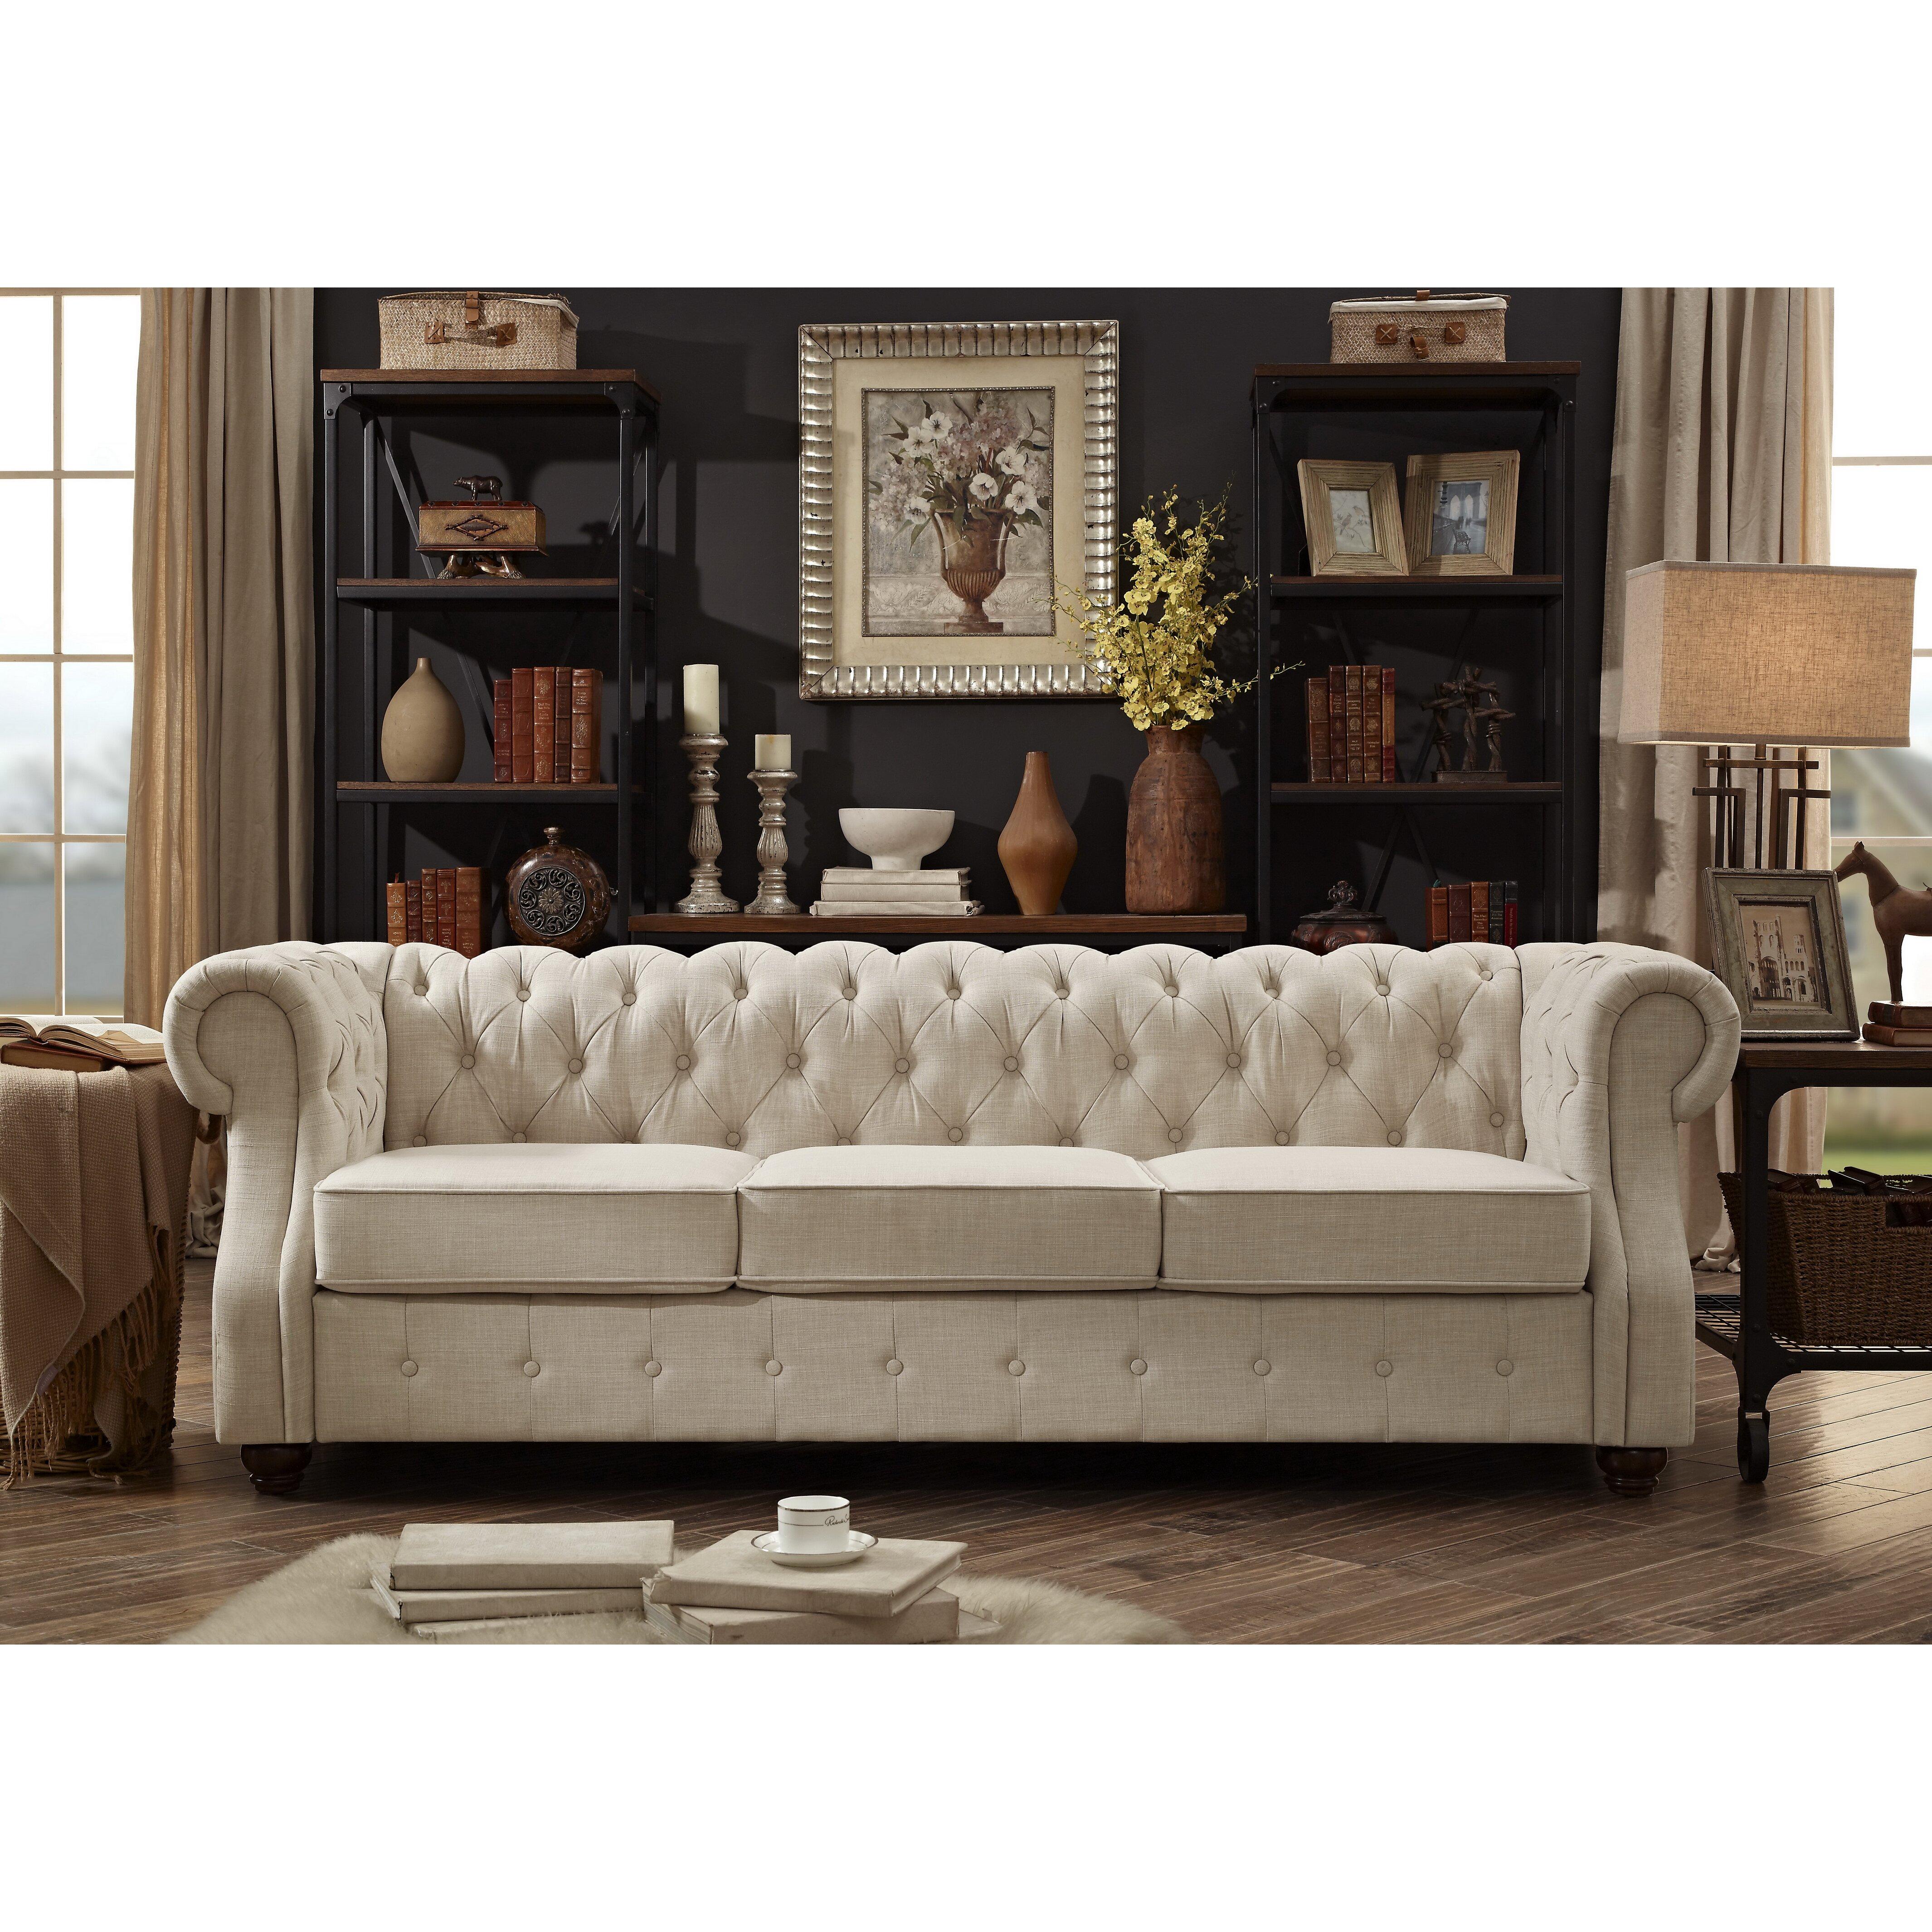 Wayfair Living Room Furniture Mulhouse Furniture Olivia Tufted Sofa Reviews Wayfair